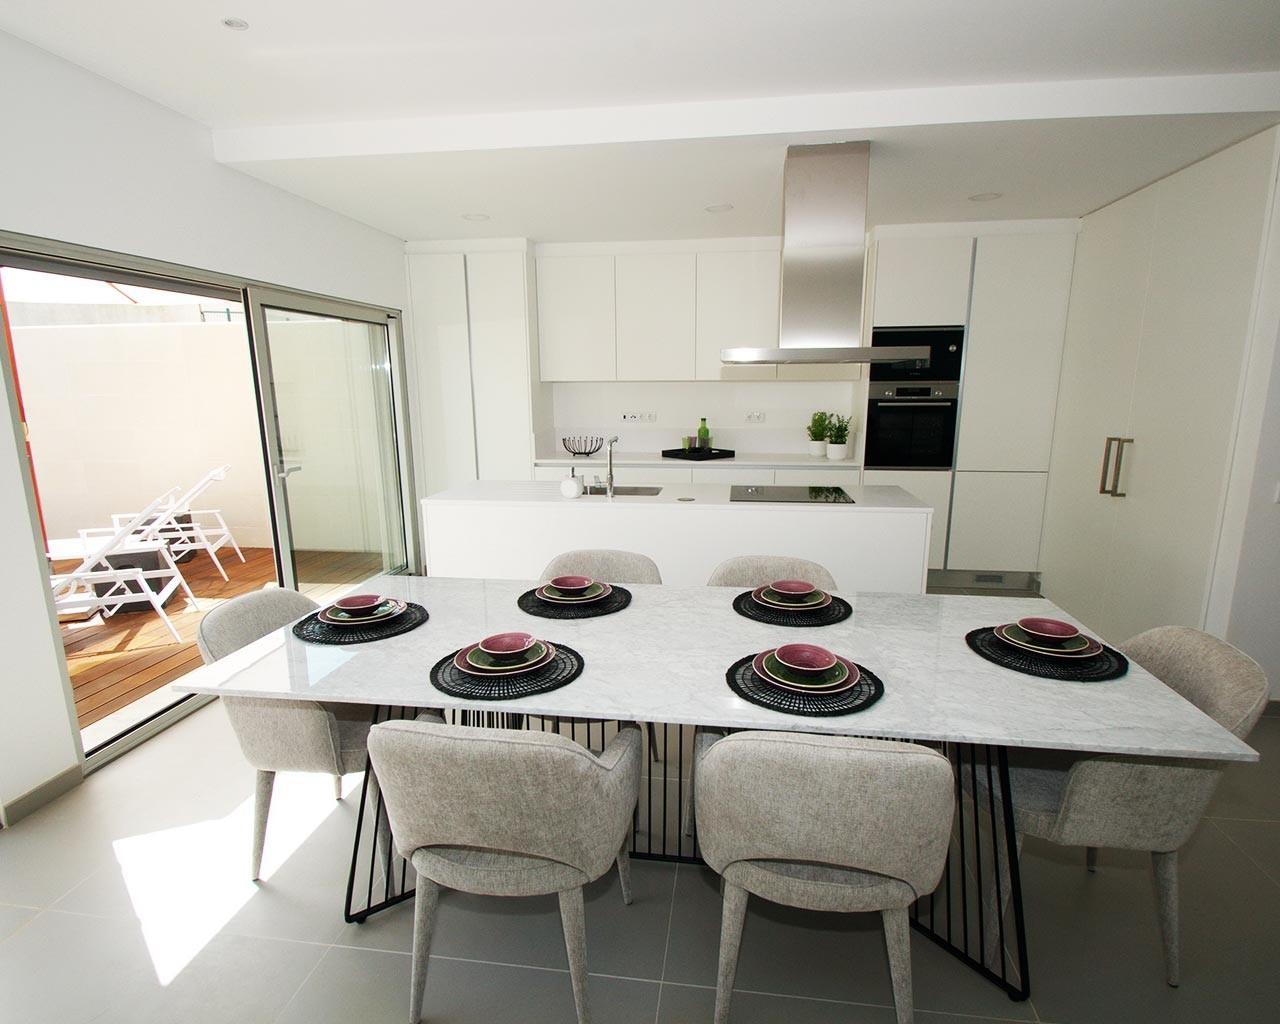 ferragudo-design-villas-cuisine-salle à manger